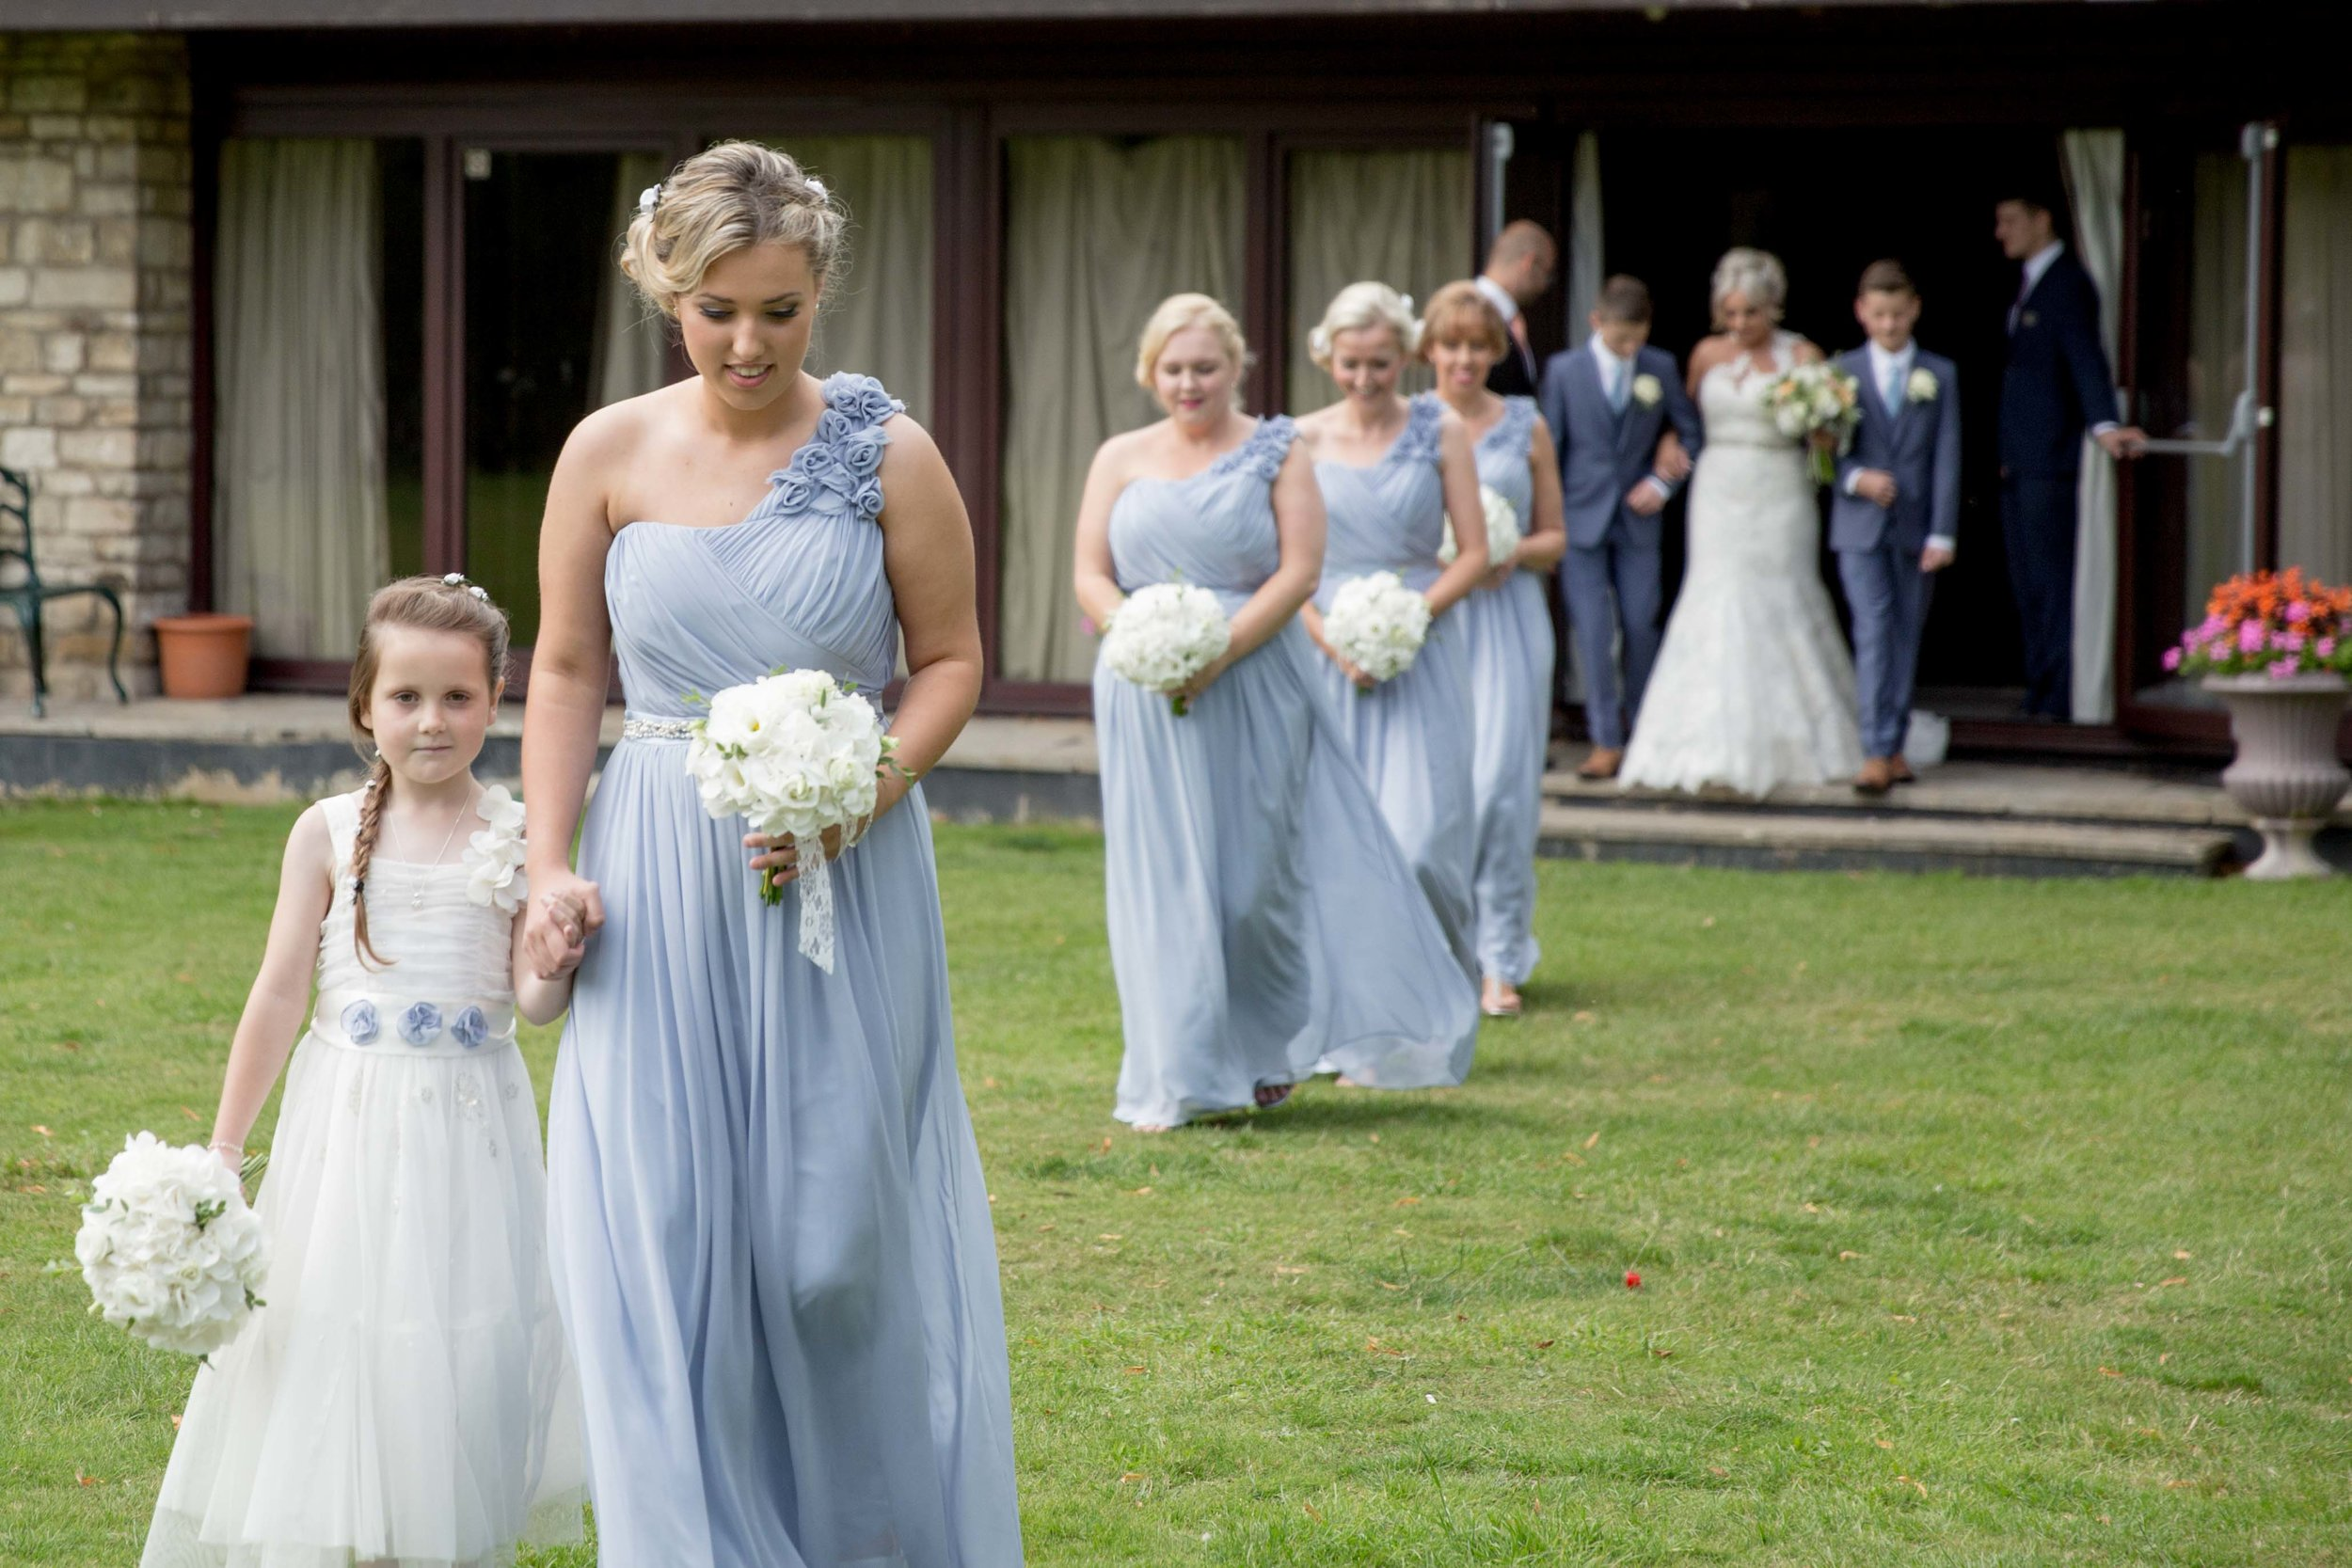 cotswold-wedding-photography-at-stonehouse-court-hotel-natalia-smith-photography-gloucestershire-wedding-photographer-7.jpg